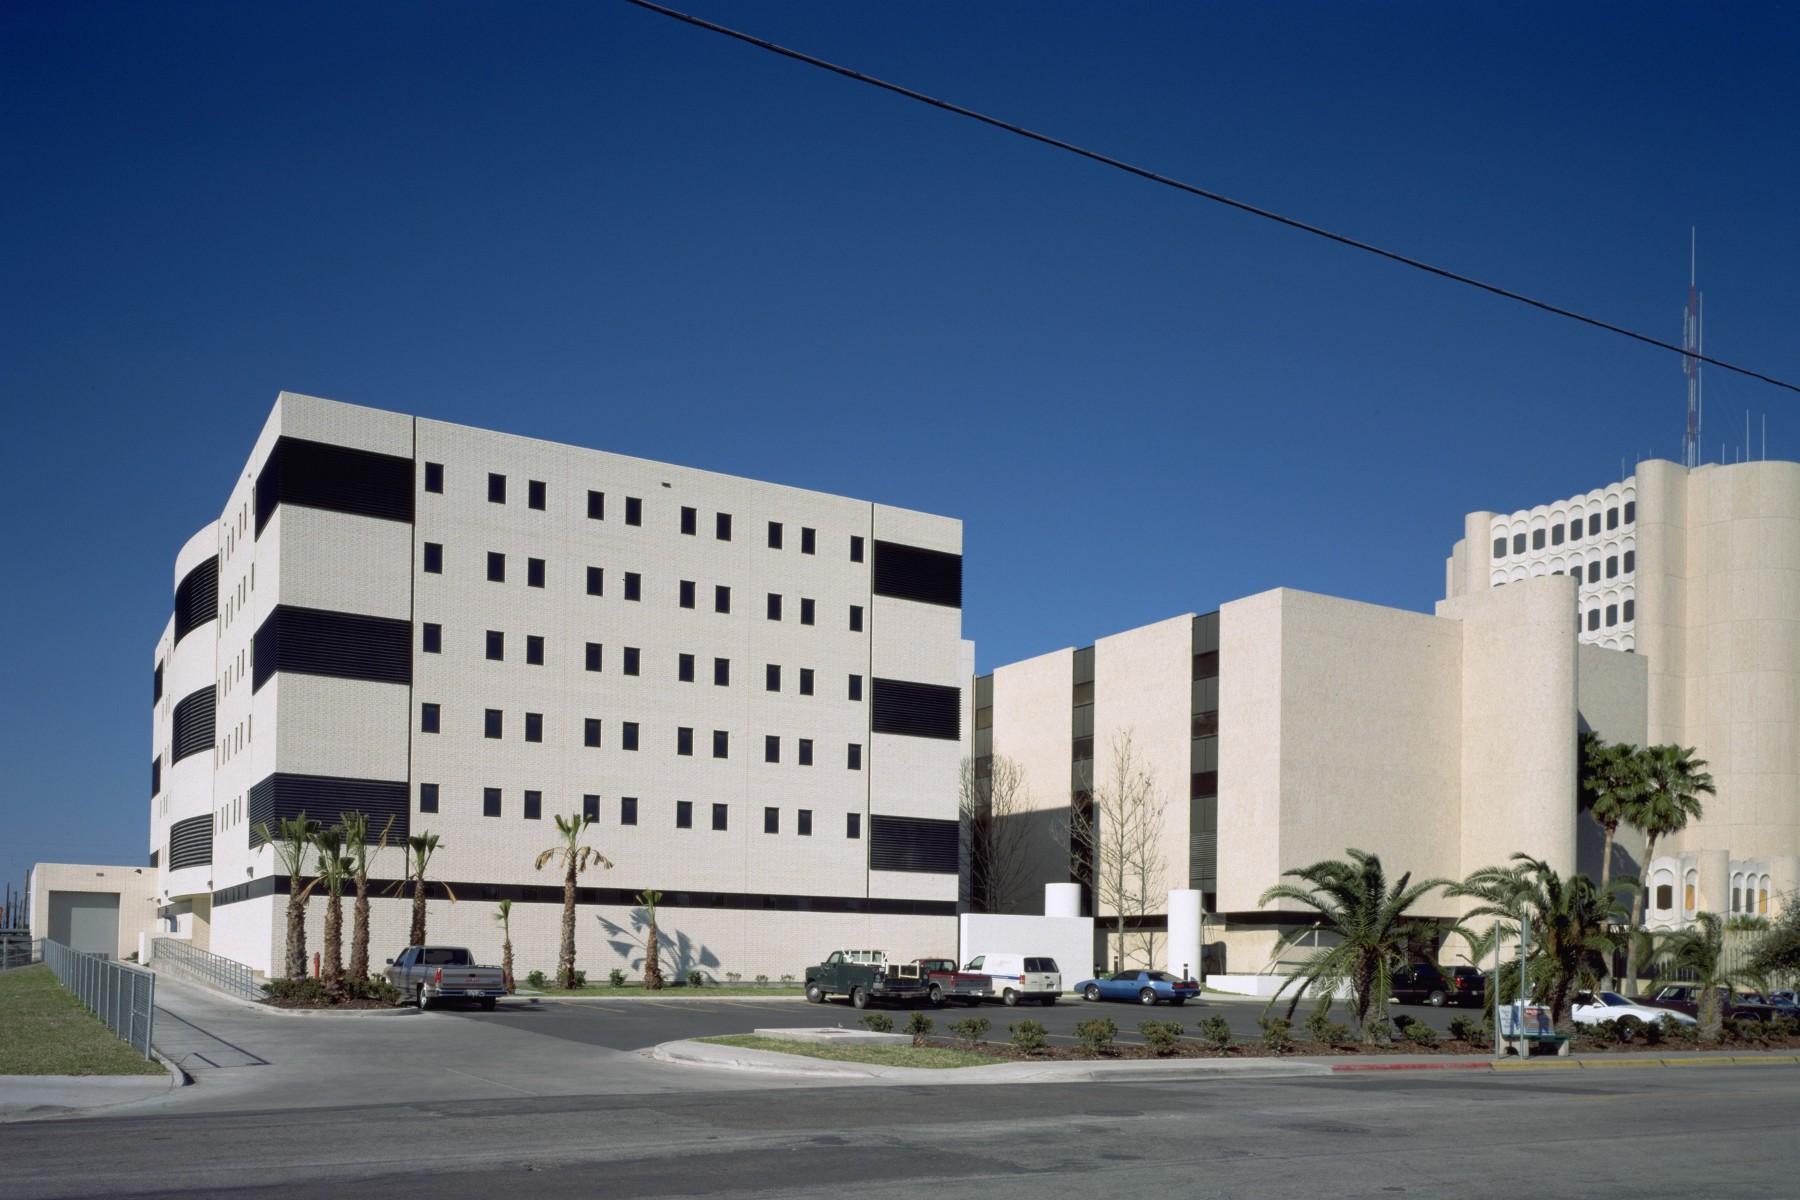 waco jail exterior.jpg